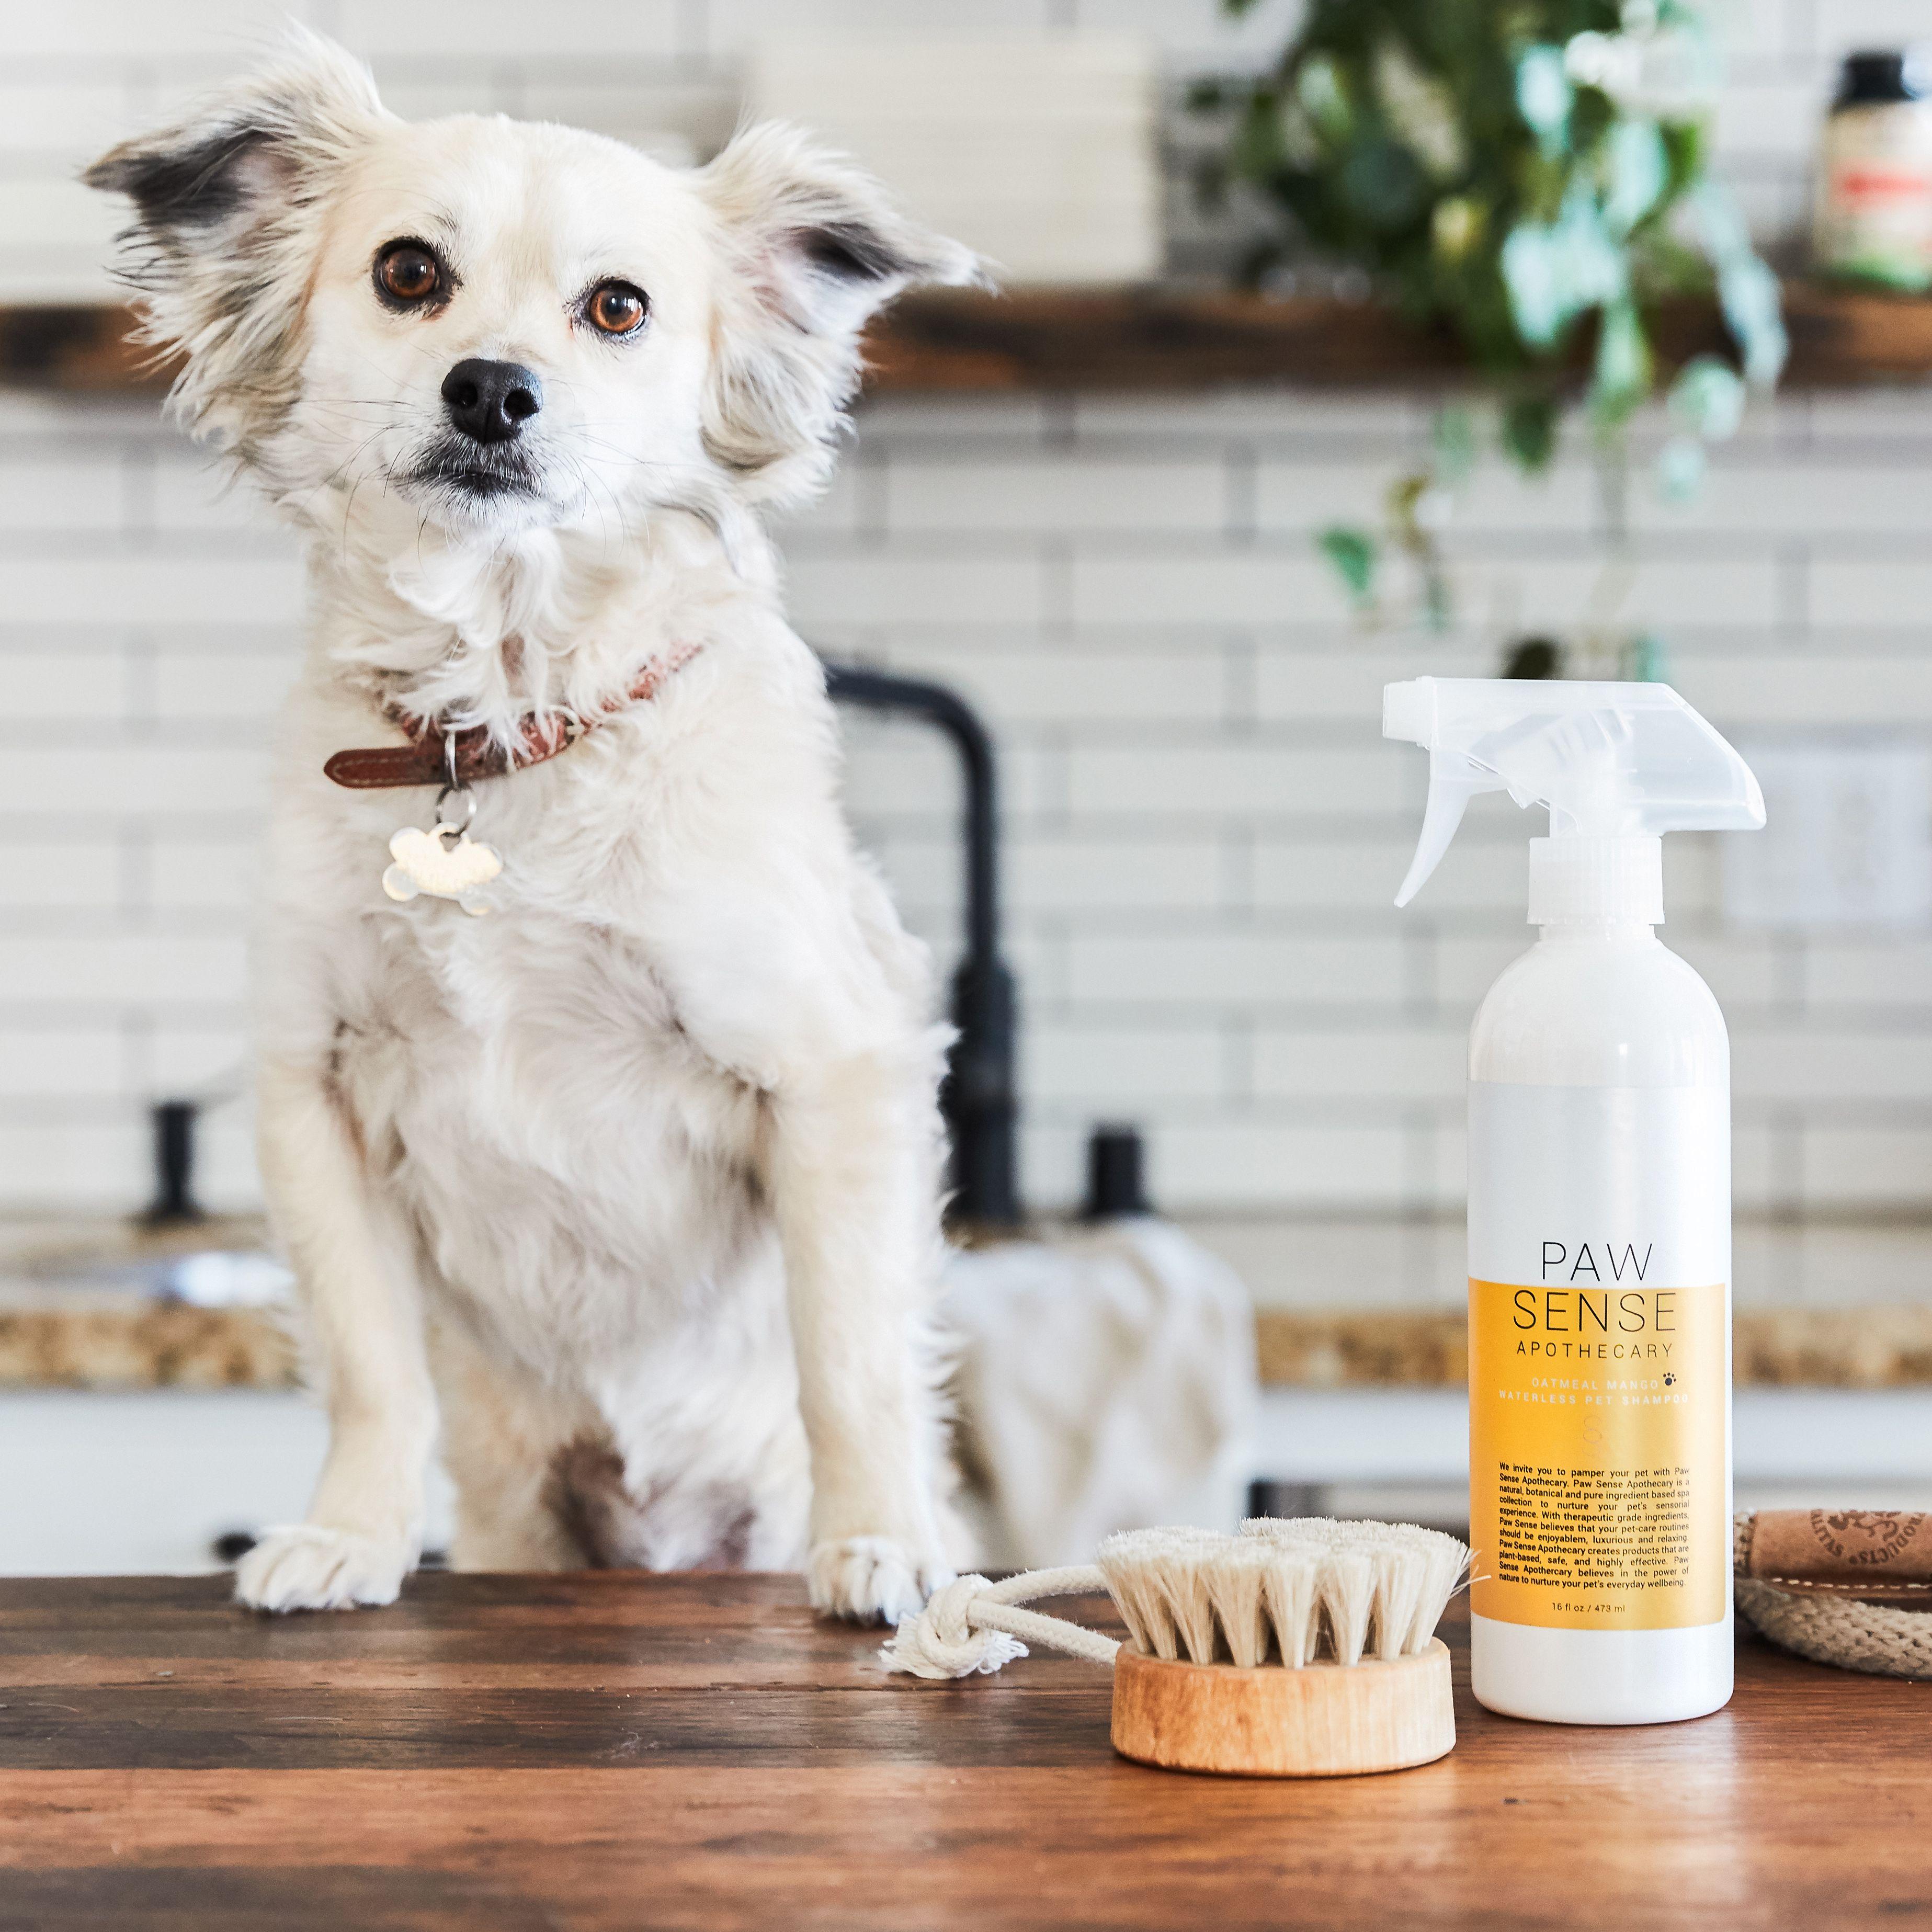 Paw Sense Waterless Pet Shampoo Pet Shampoo Pets Grooming Tools